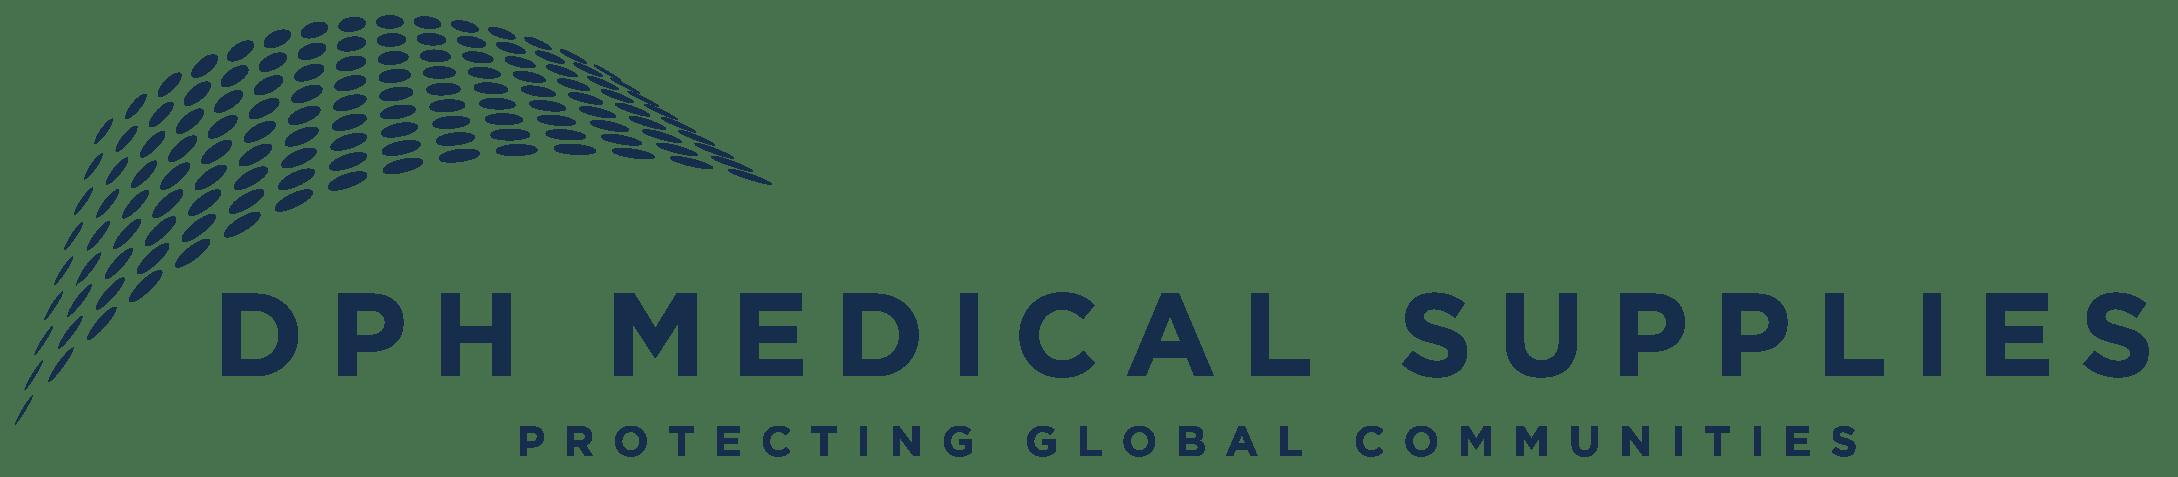 DPH Medical Supplies Logo